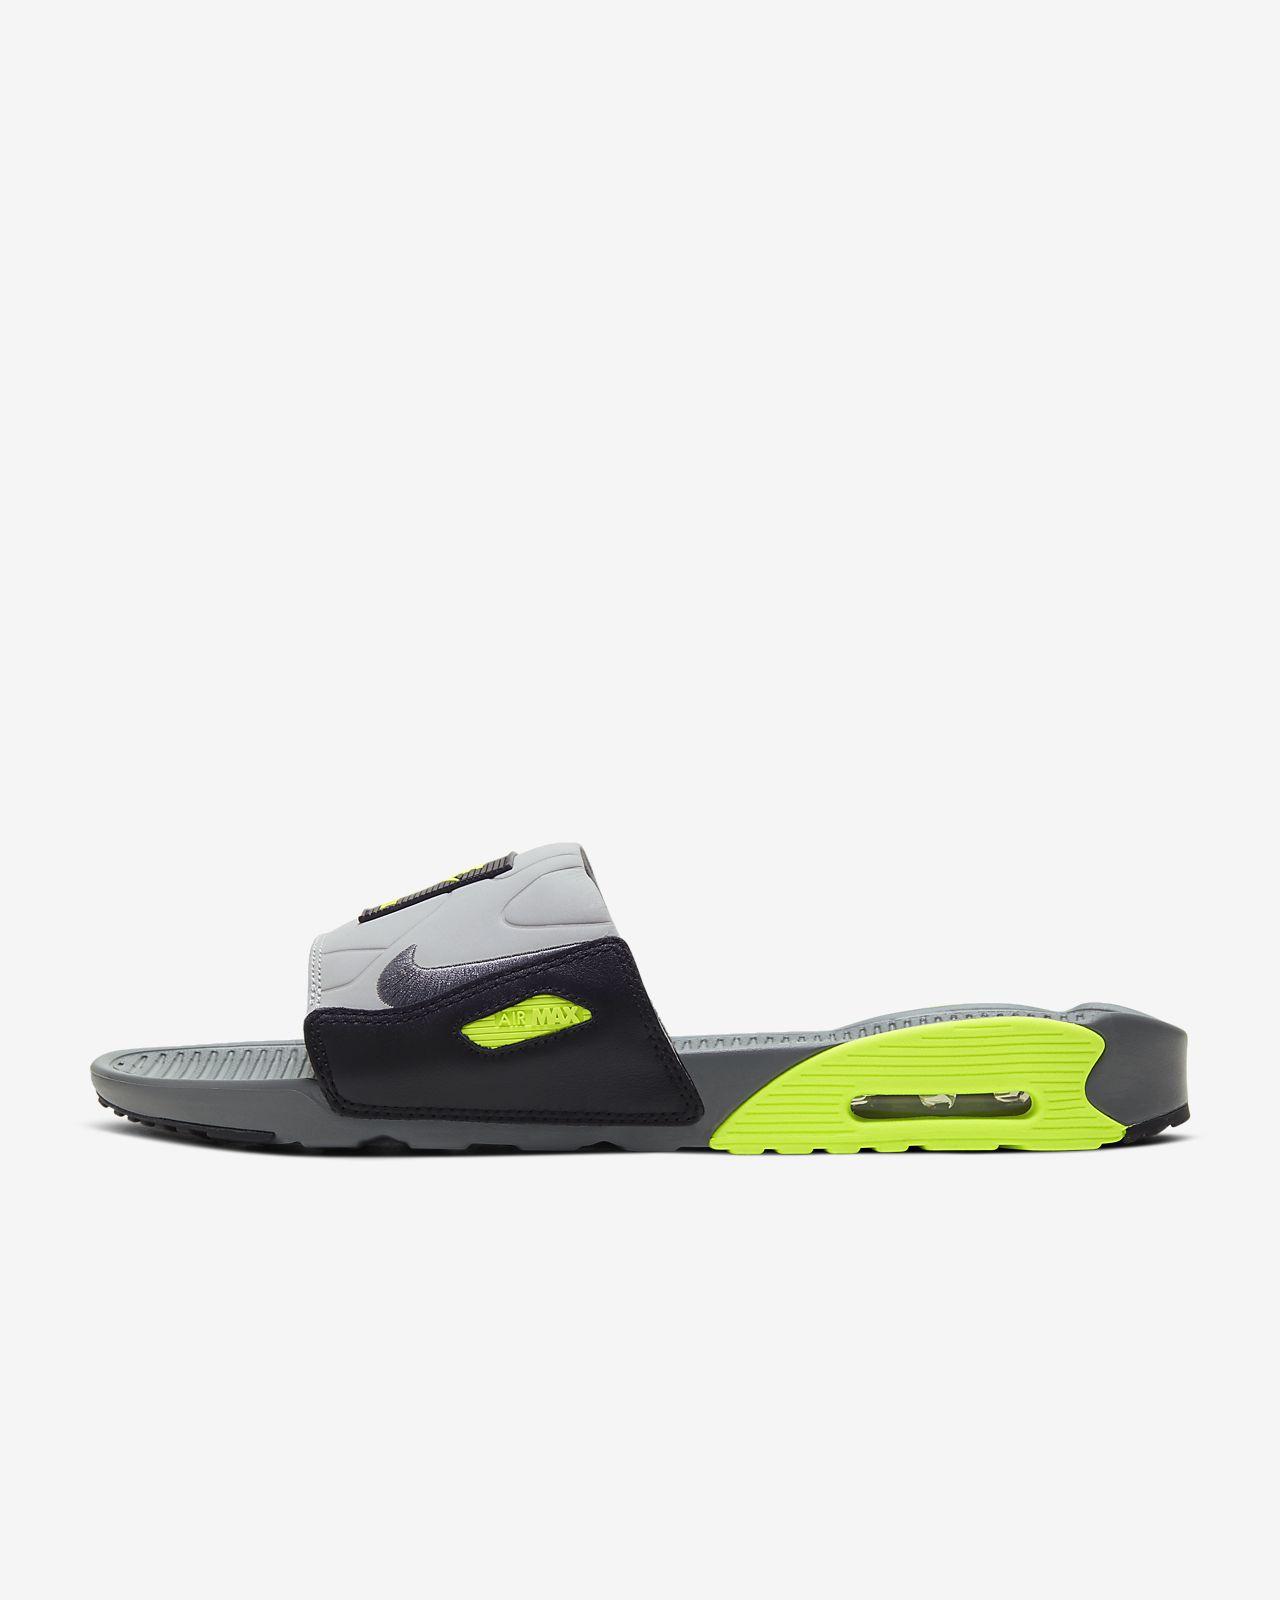 nike air max slippers kopen